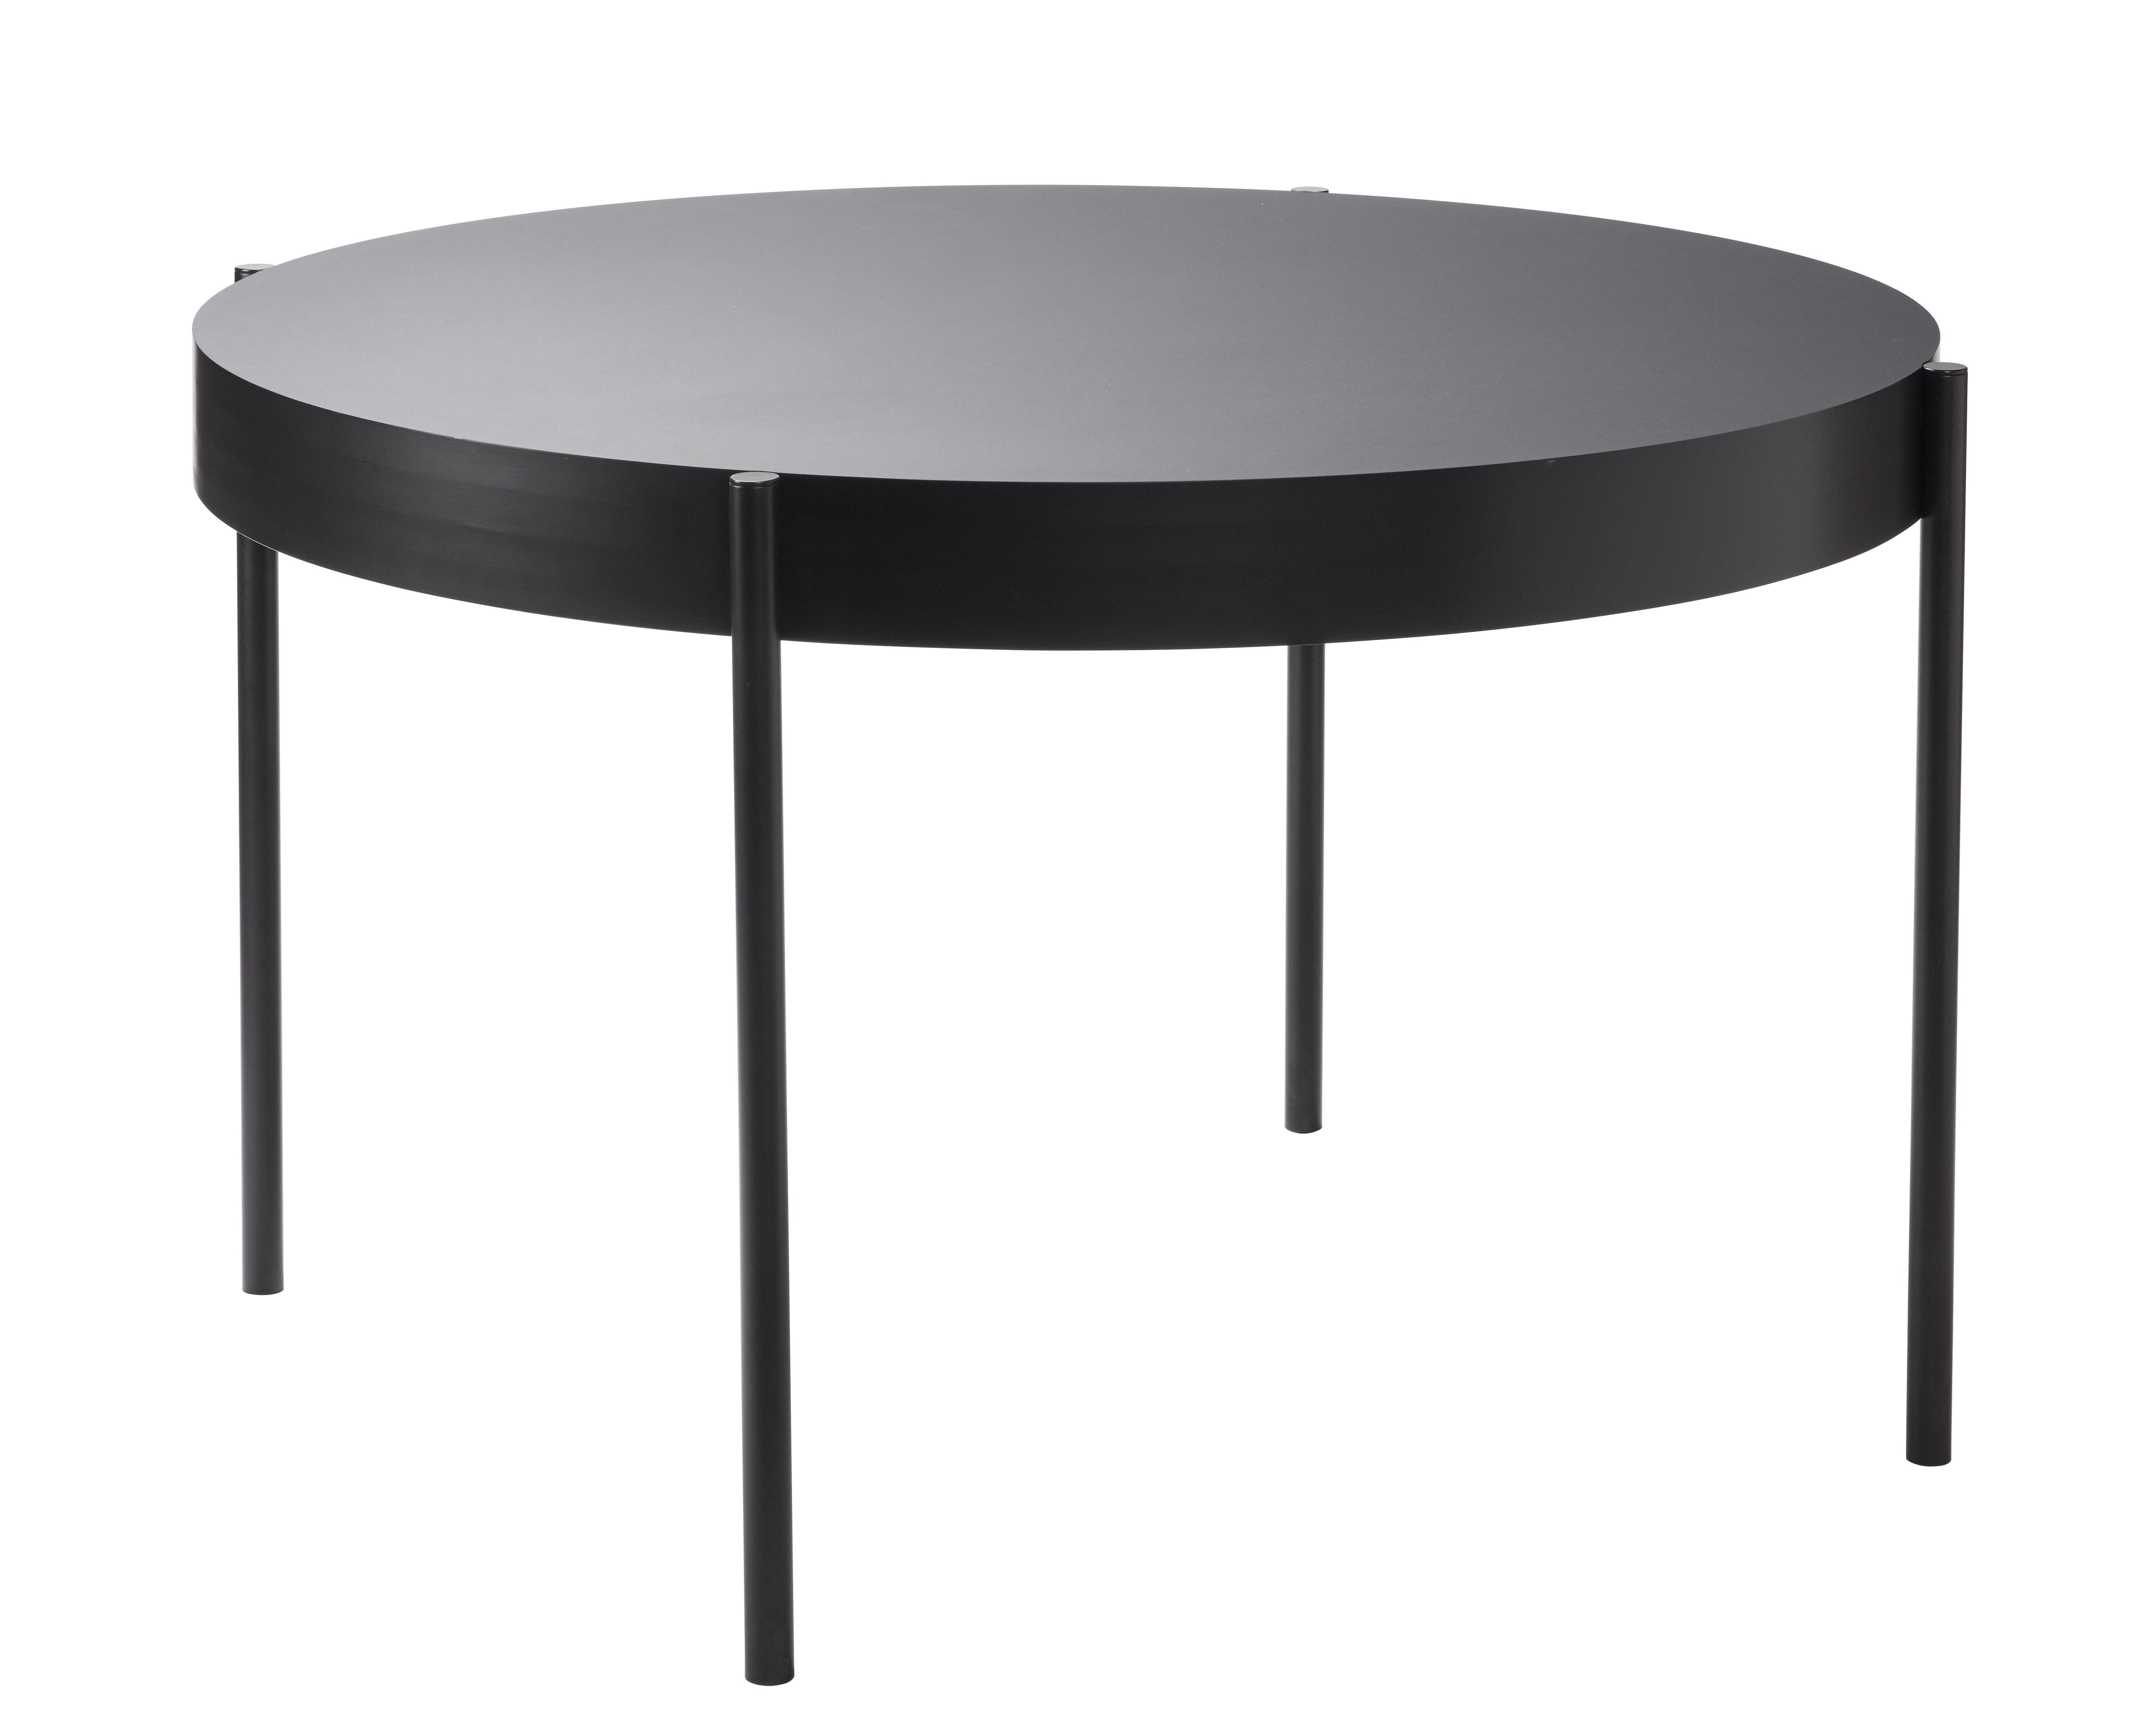 Trends - Dinner Time - Series 430 Table - / Ø 120 cm - Fenix-NTM® by Verpan - Fenix-NTM® / Black - Lacquered steel, MDF, Thermo-stratified Fenix-NTM®